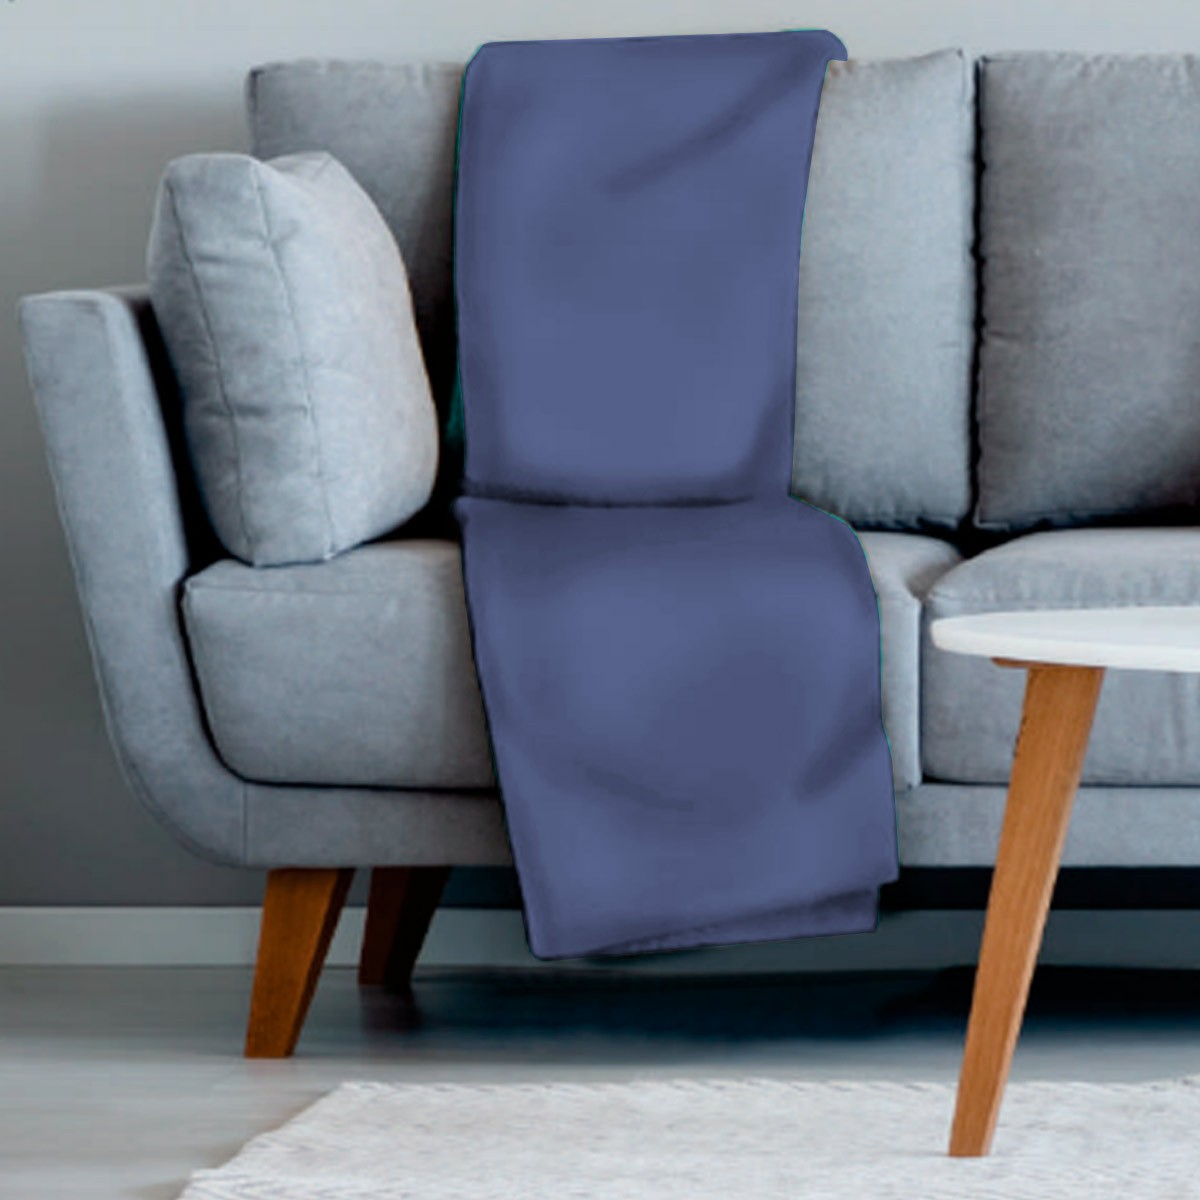 Manta sofa veludo 210x140 AZUL MARINHO